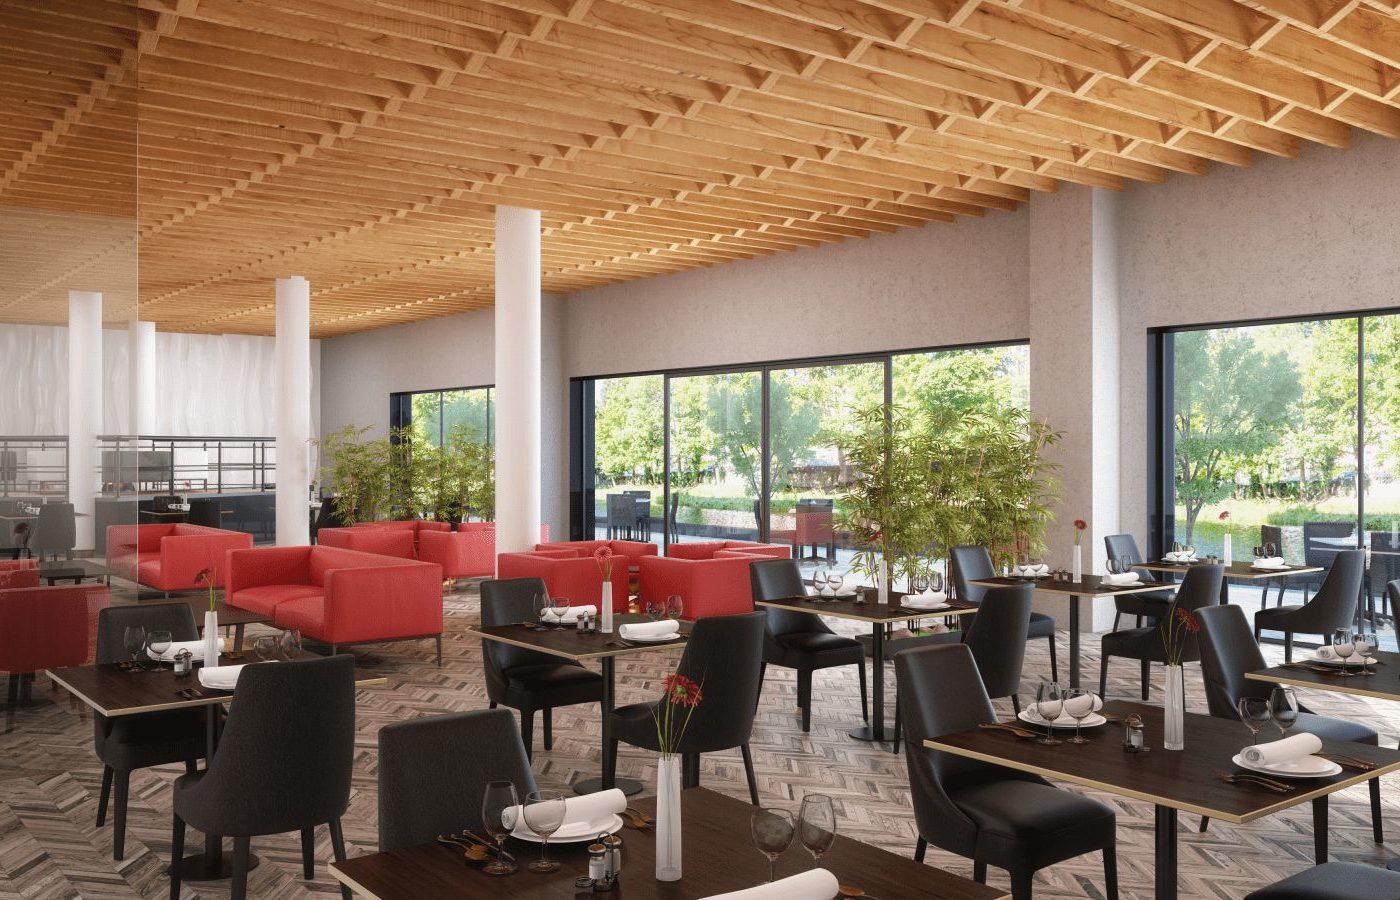 Restaurant Seating RESIZE